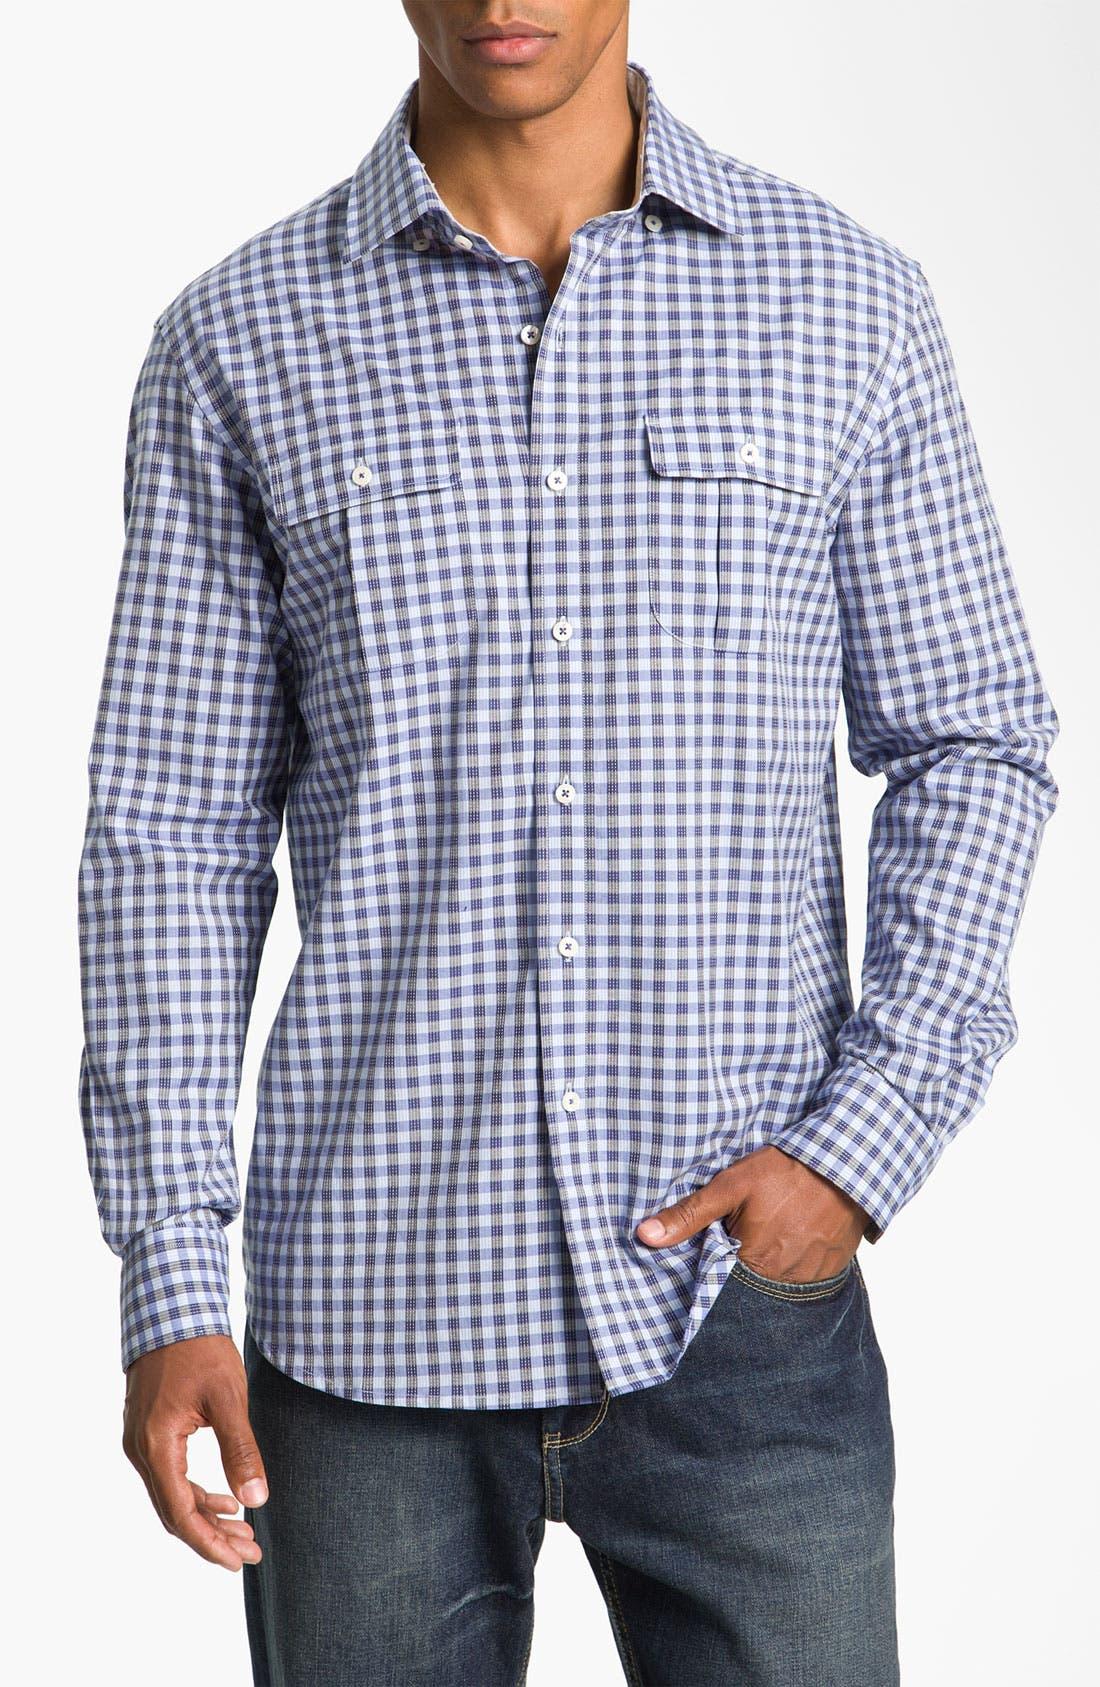 Main Image - Tommy Bahama 'Waterway' Sport Shirt